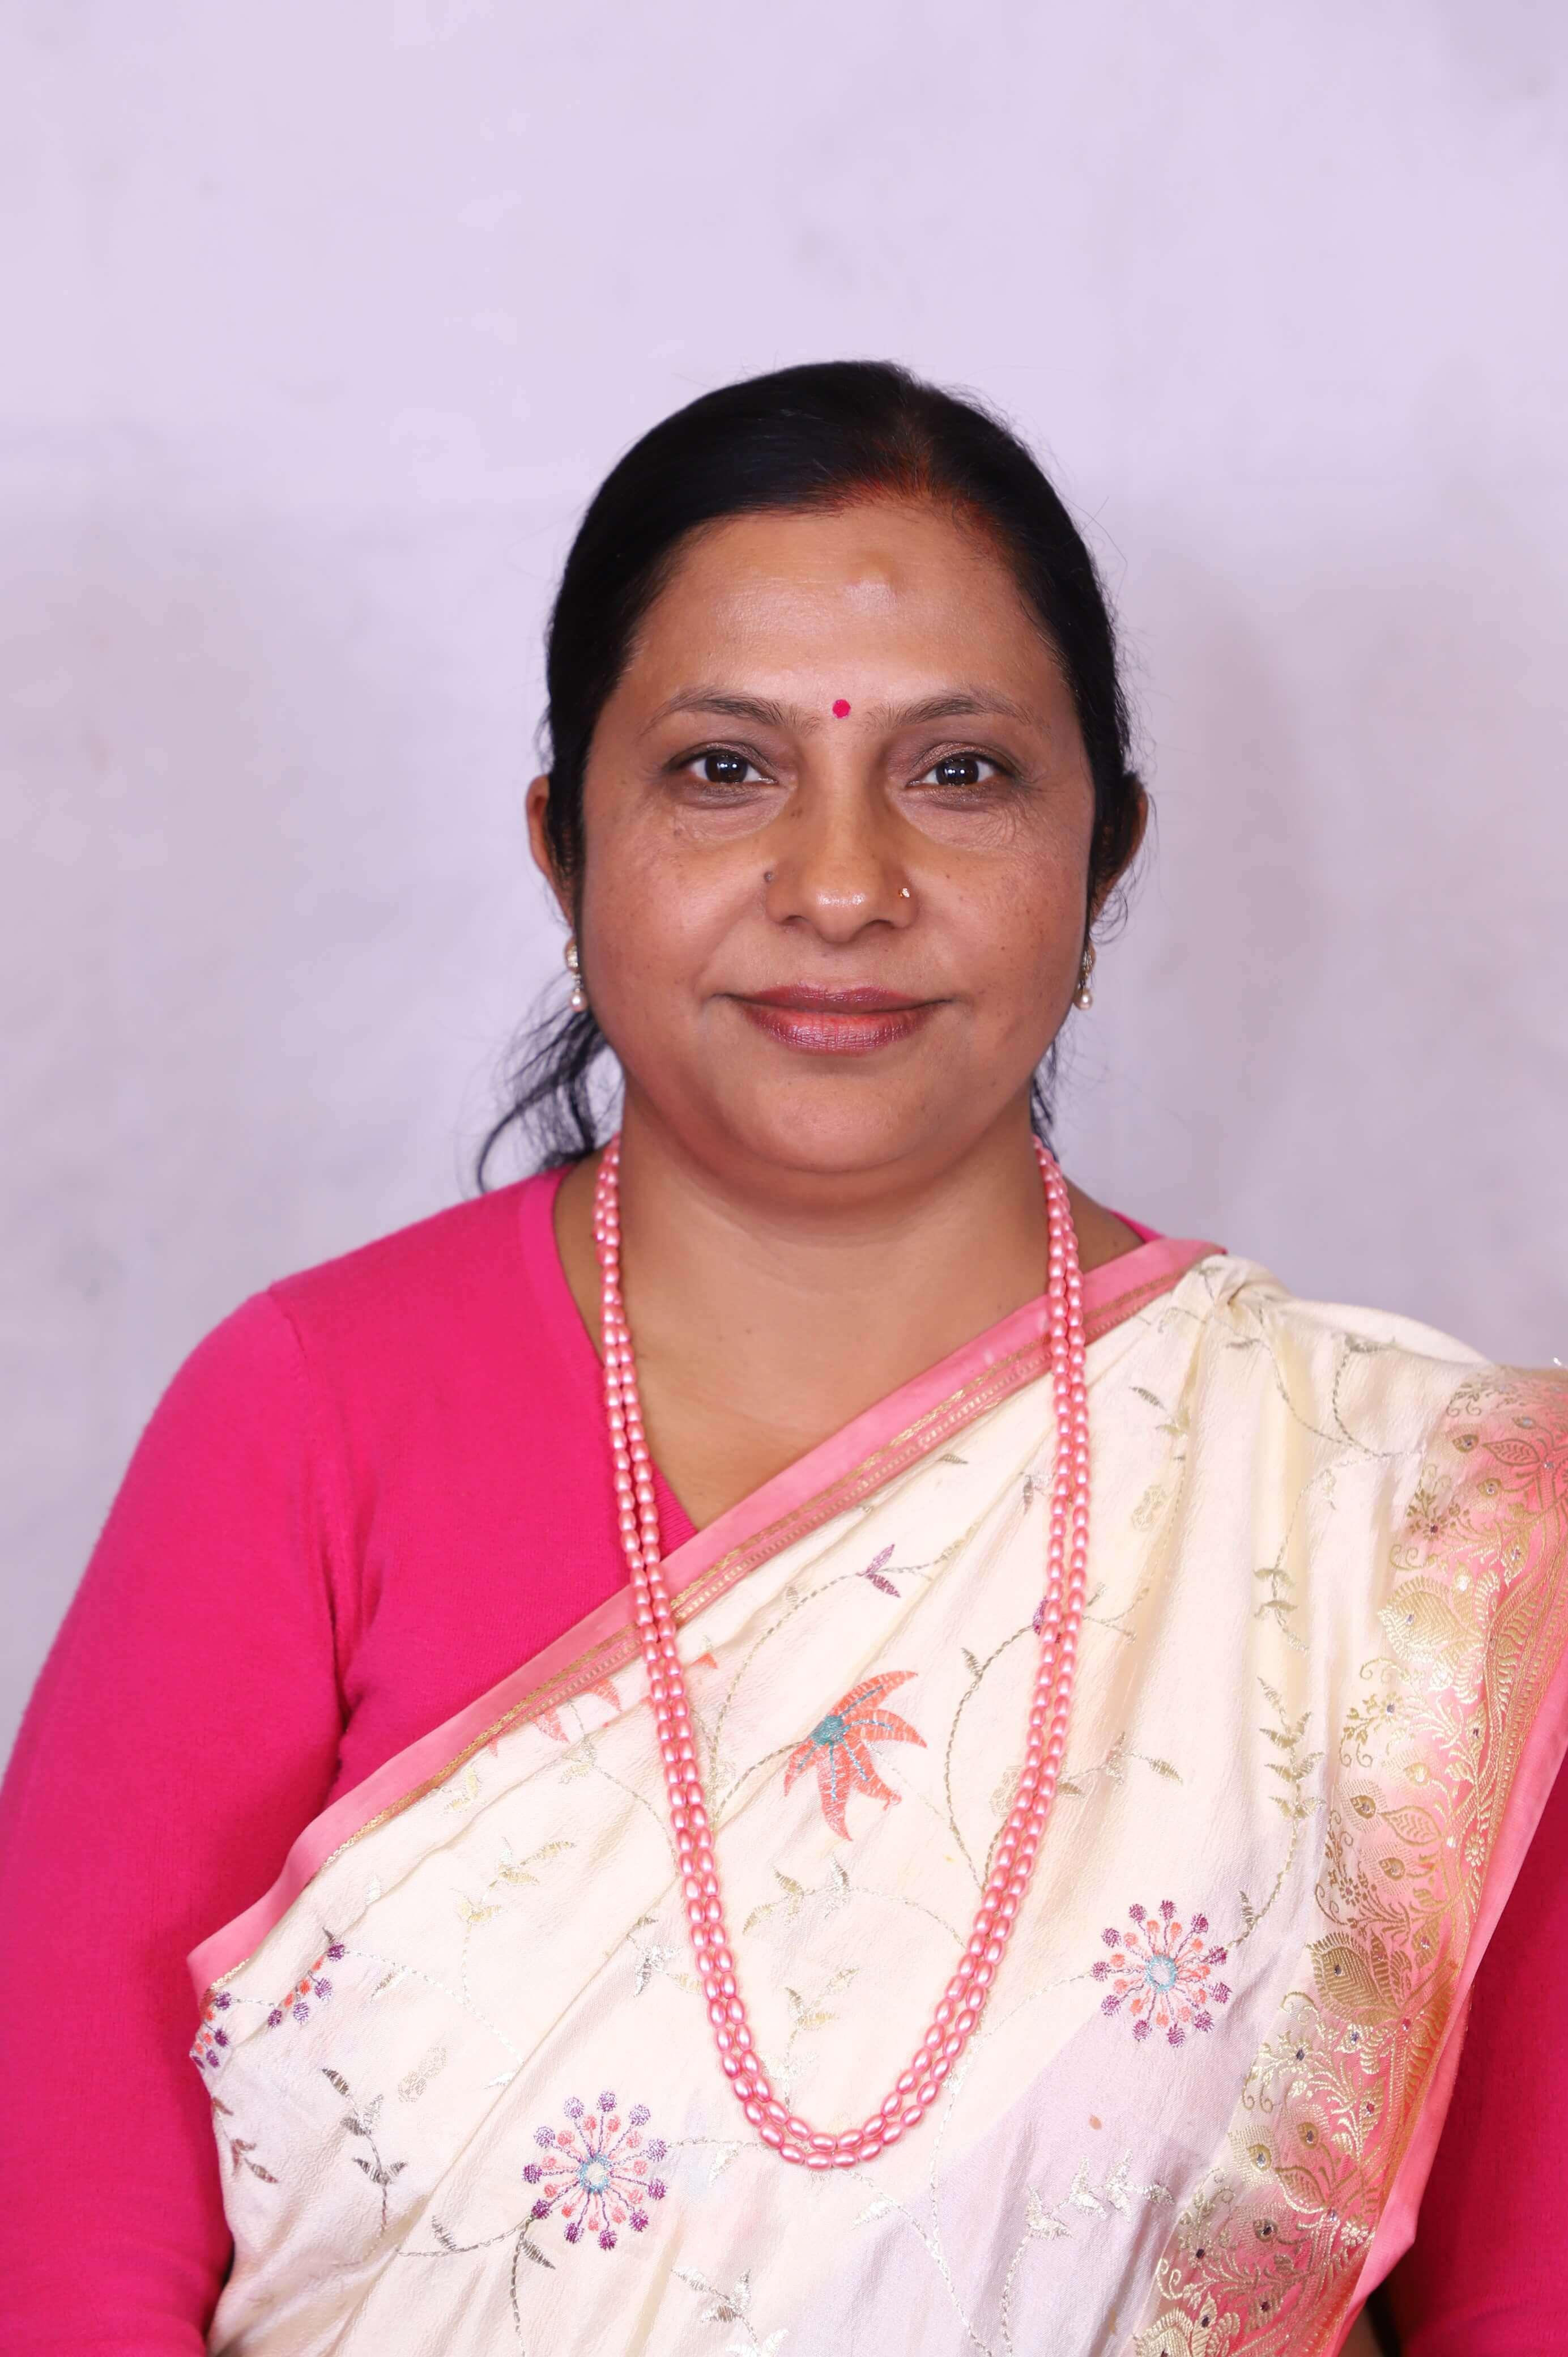 Ms. Goma Nepal